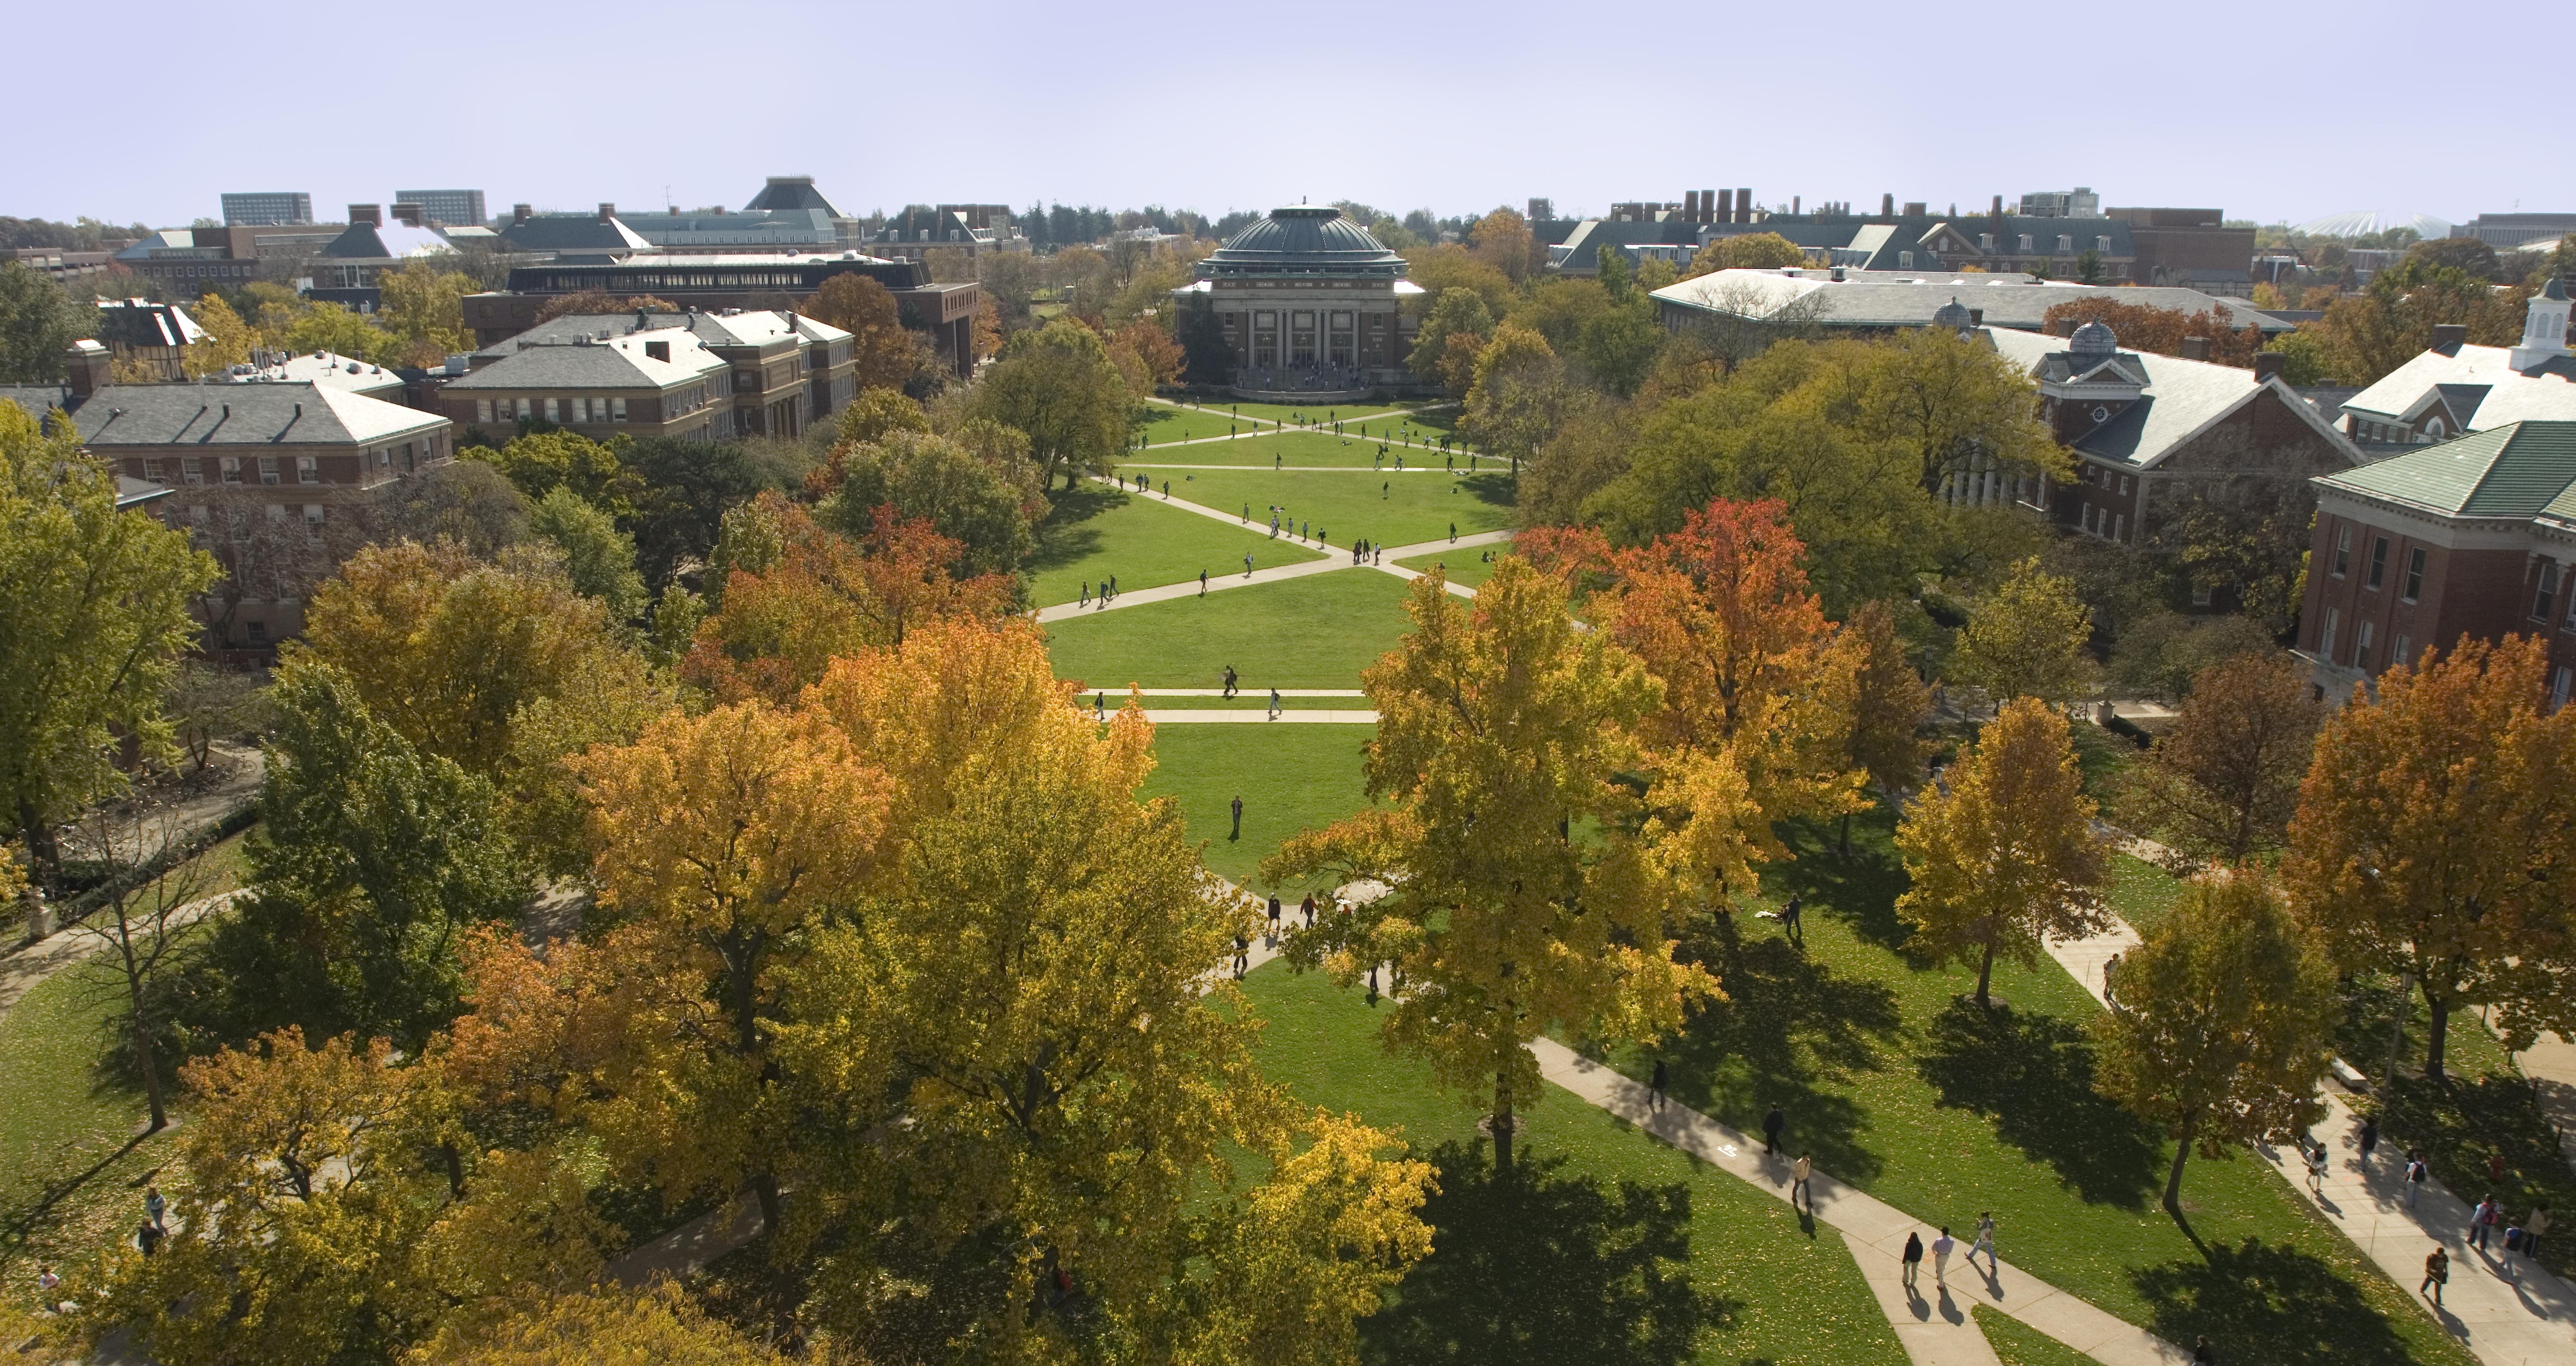 Online Mba Imba By University Of Illinois At Urbana Champaign